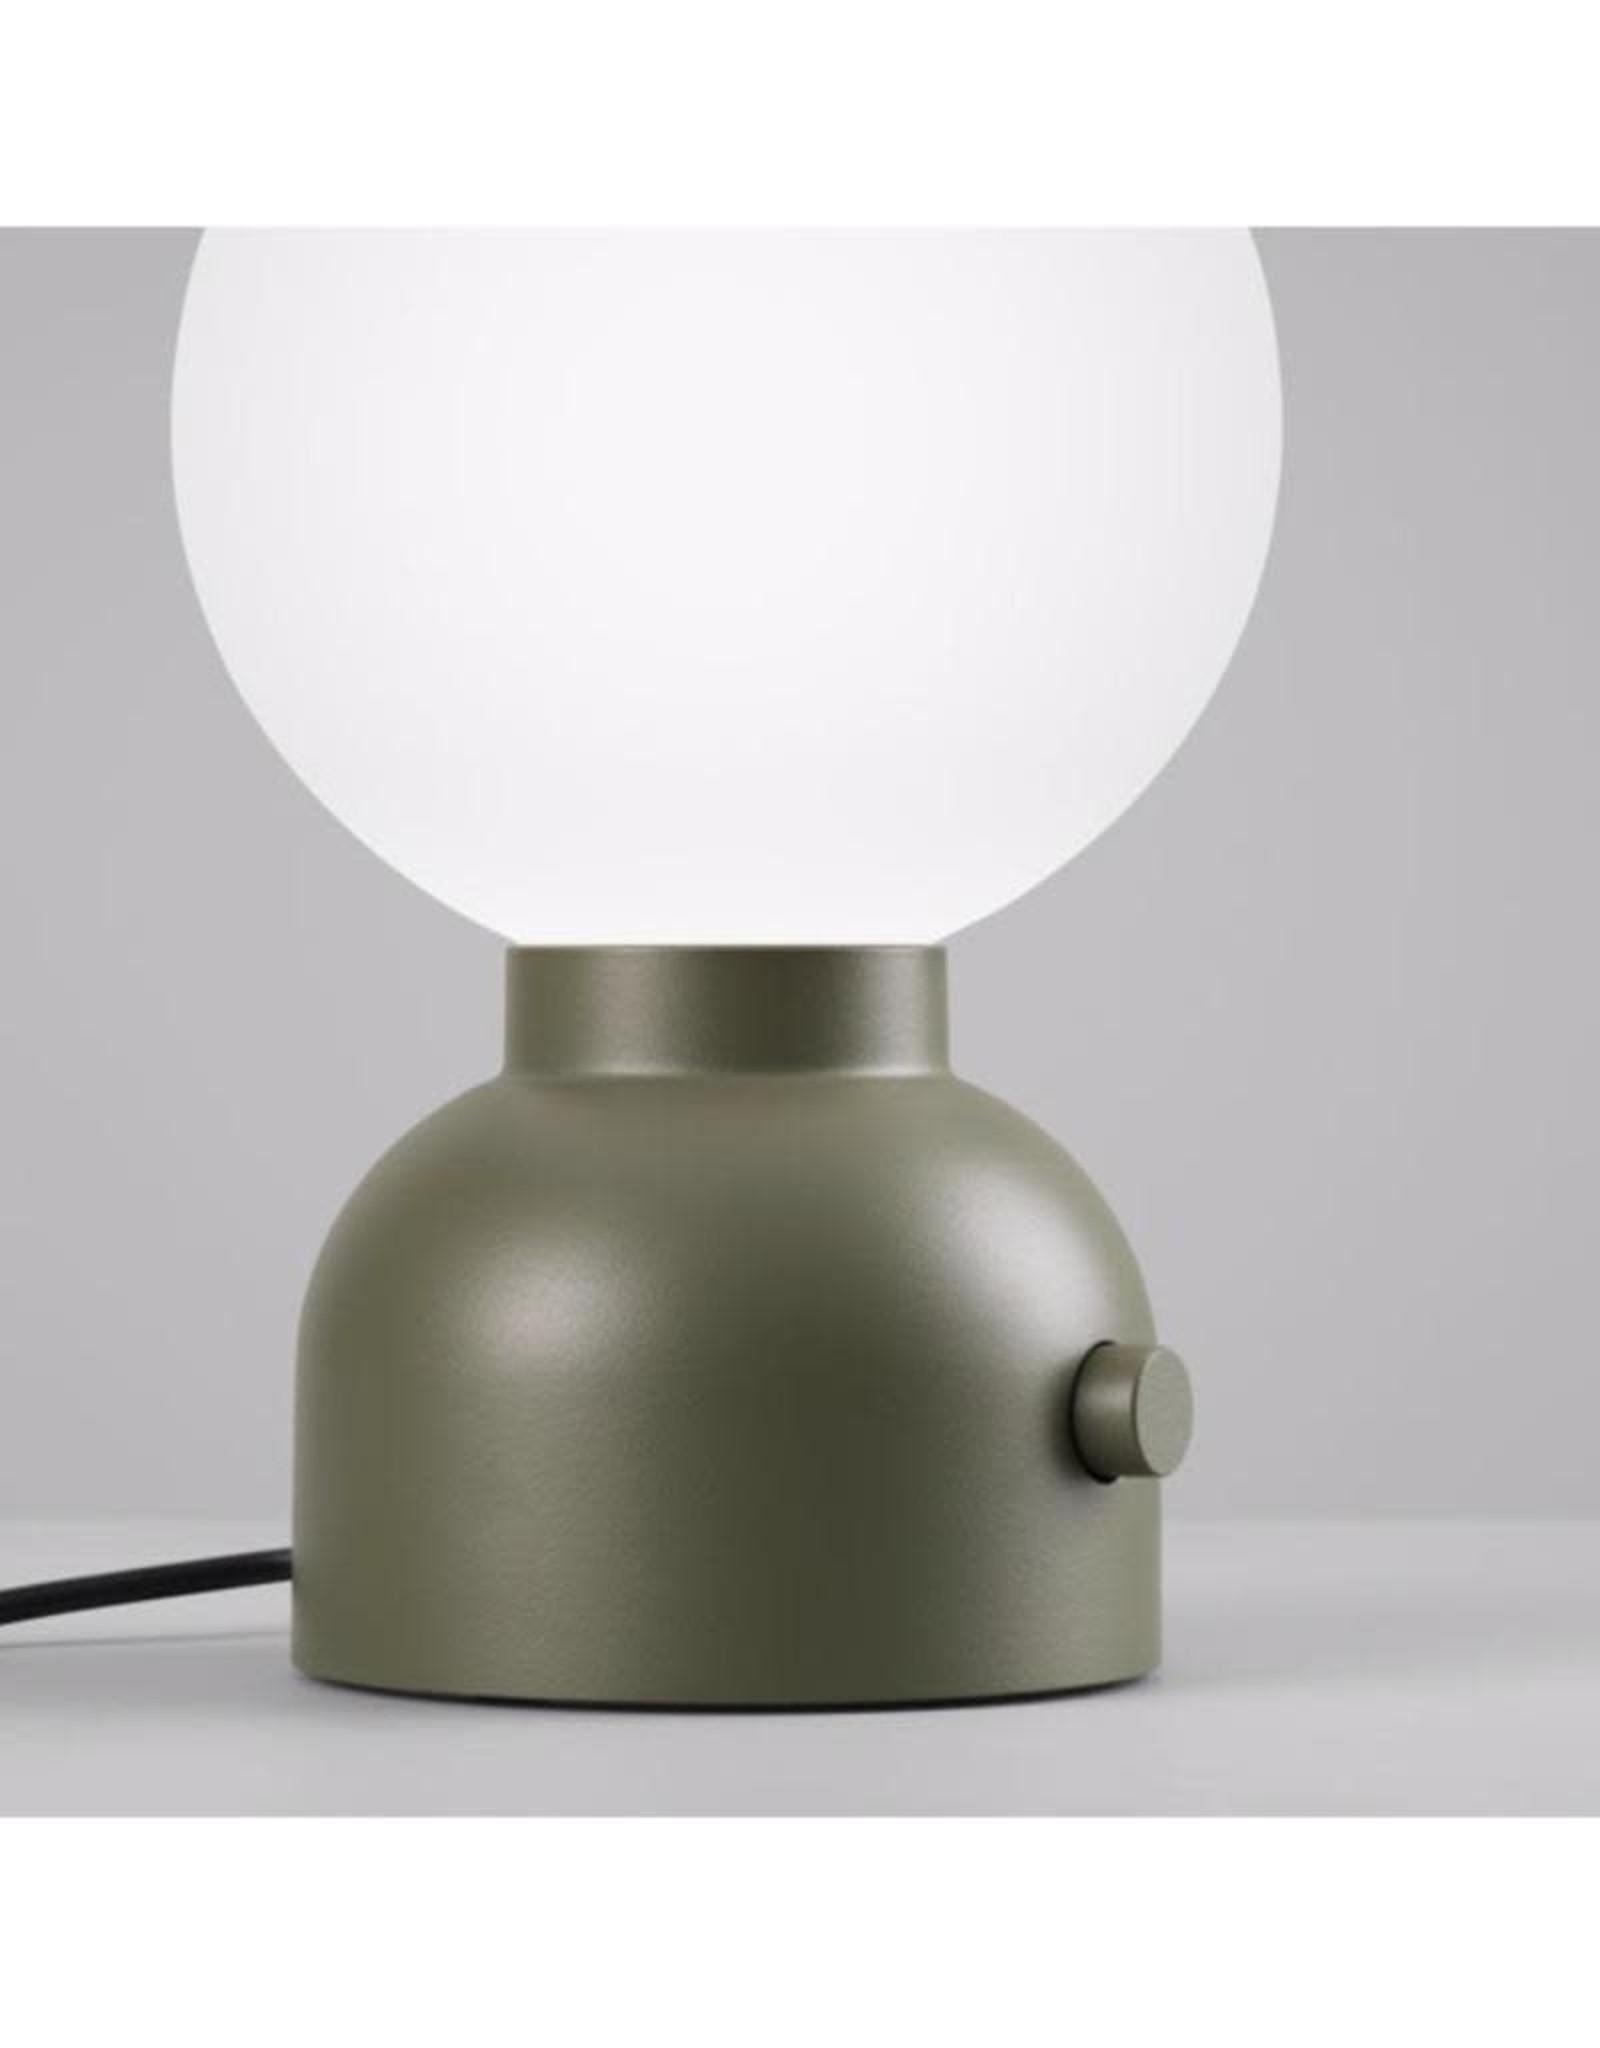 ATELJE LYKTAN PLUGGIE TABLE LAMP